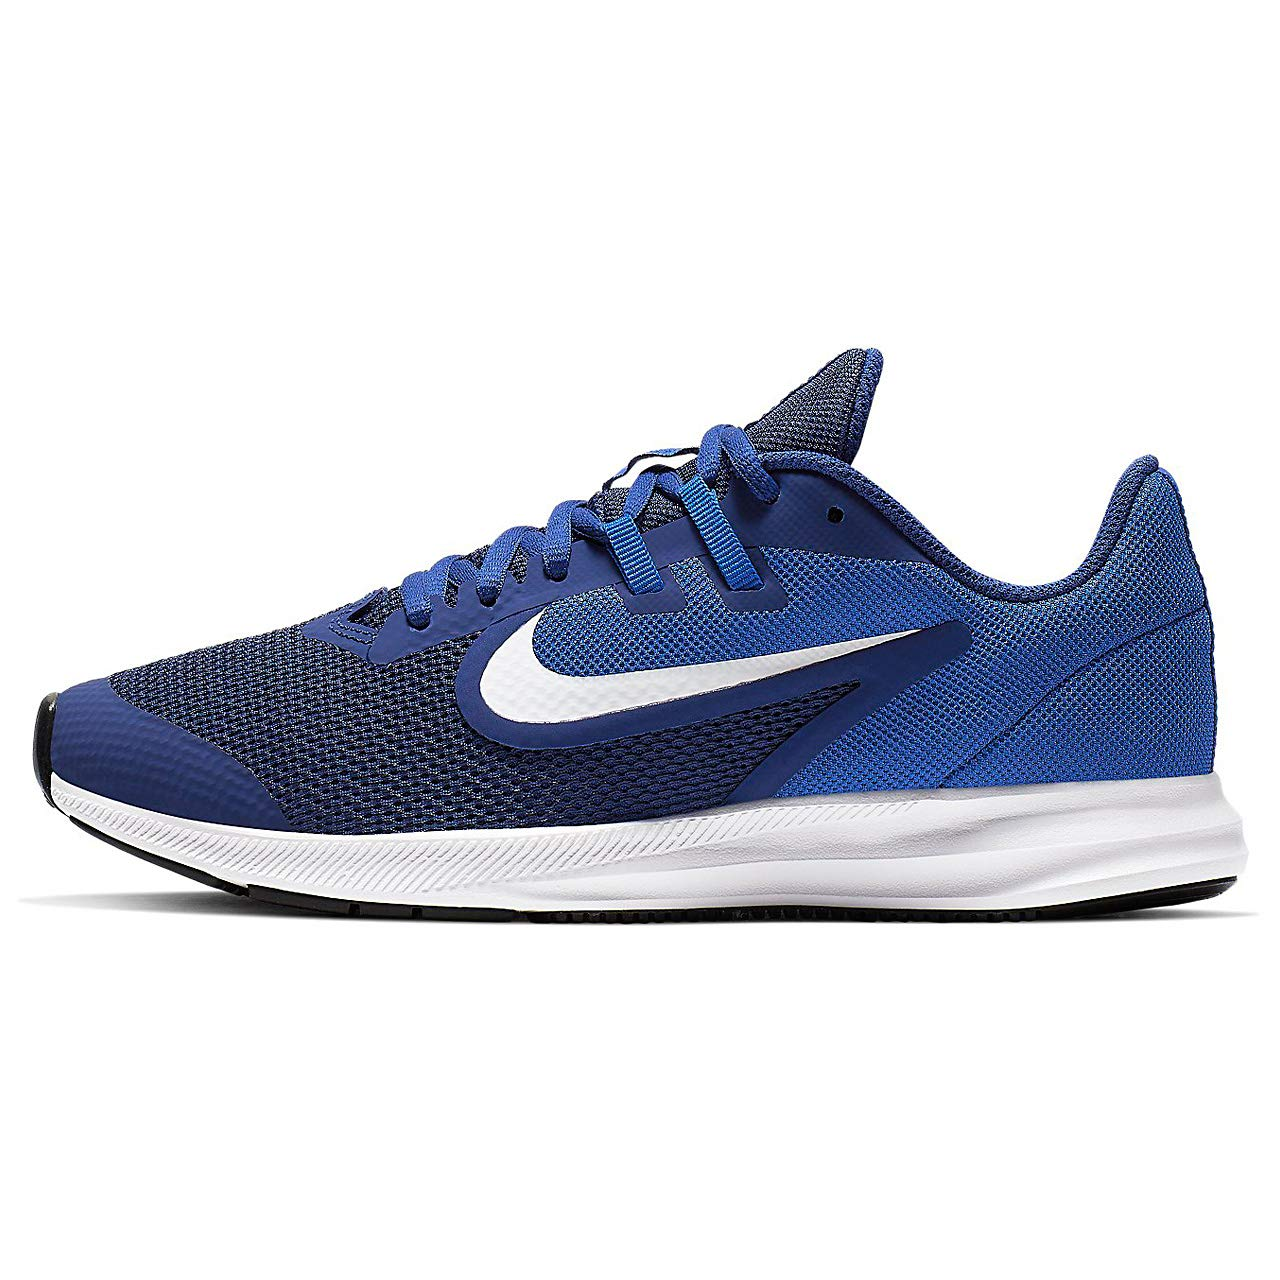 MultiCouleure (Deep Royal bleu blanc Game Royal noir 000) 38.5 EU Nike Downshifter 9 (GS), Chaussures d'Athlétisme Mixte Adulte